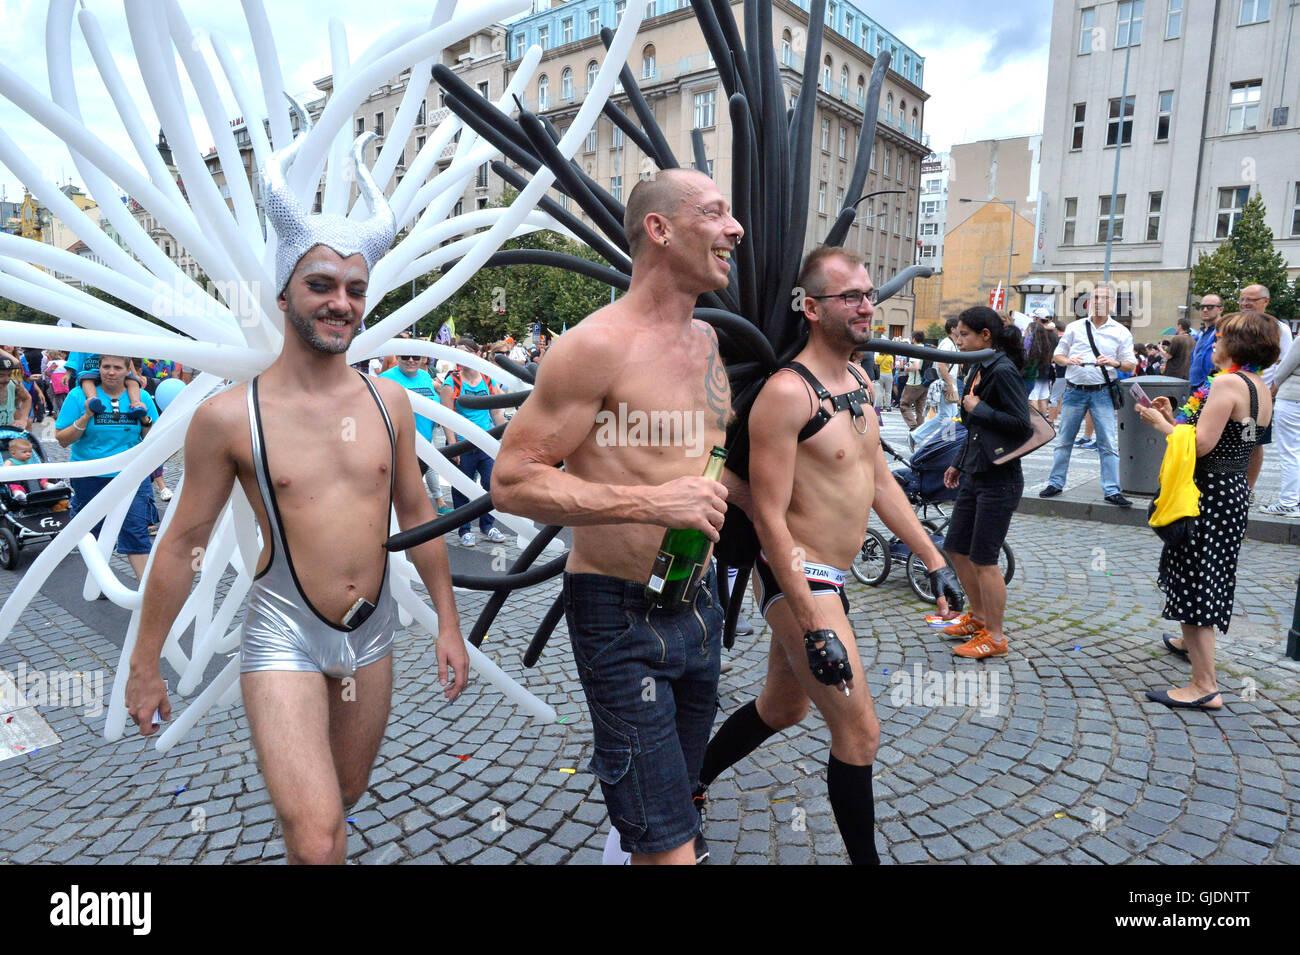 Photos Conchita Wurst Canon pour la gay pride de Prague ma queue gay gogo danseur